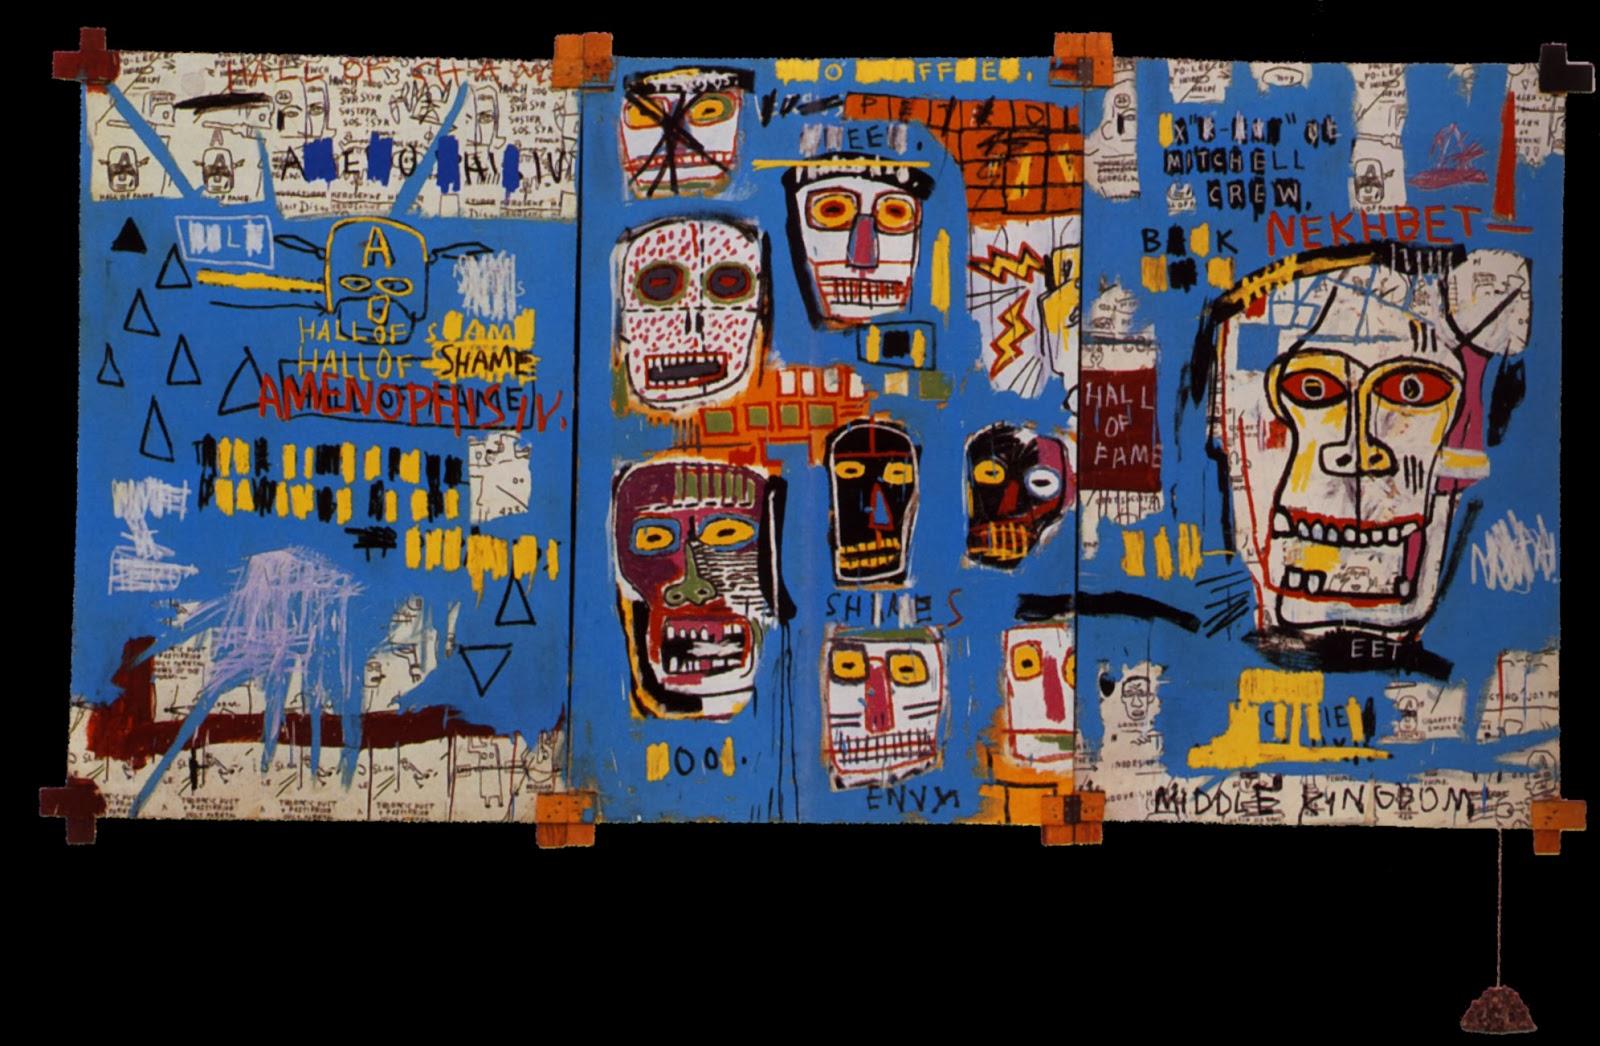 Jean Michel Basquiat Paintings For Sale